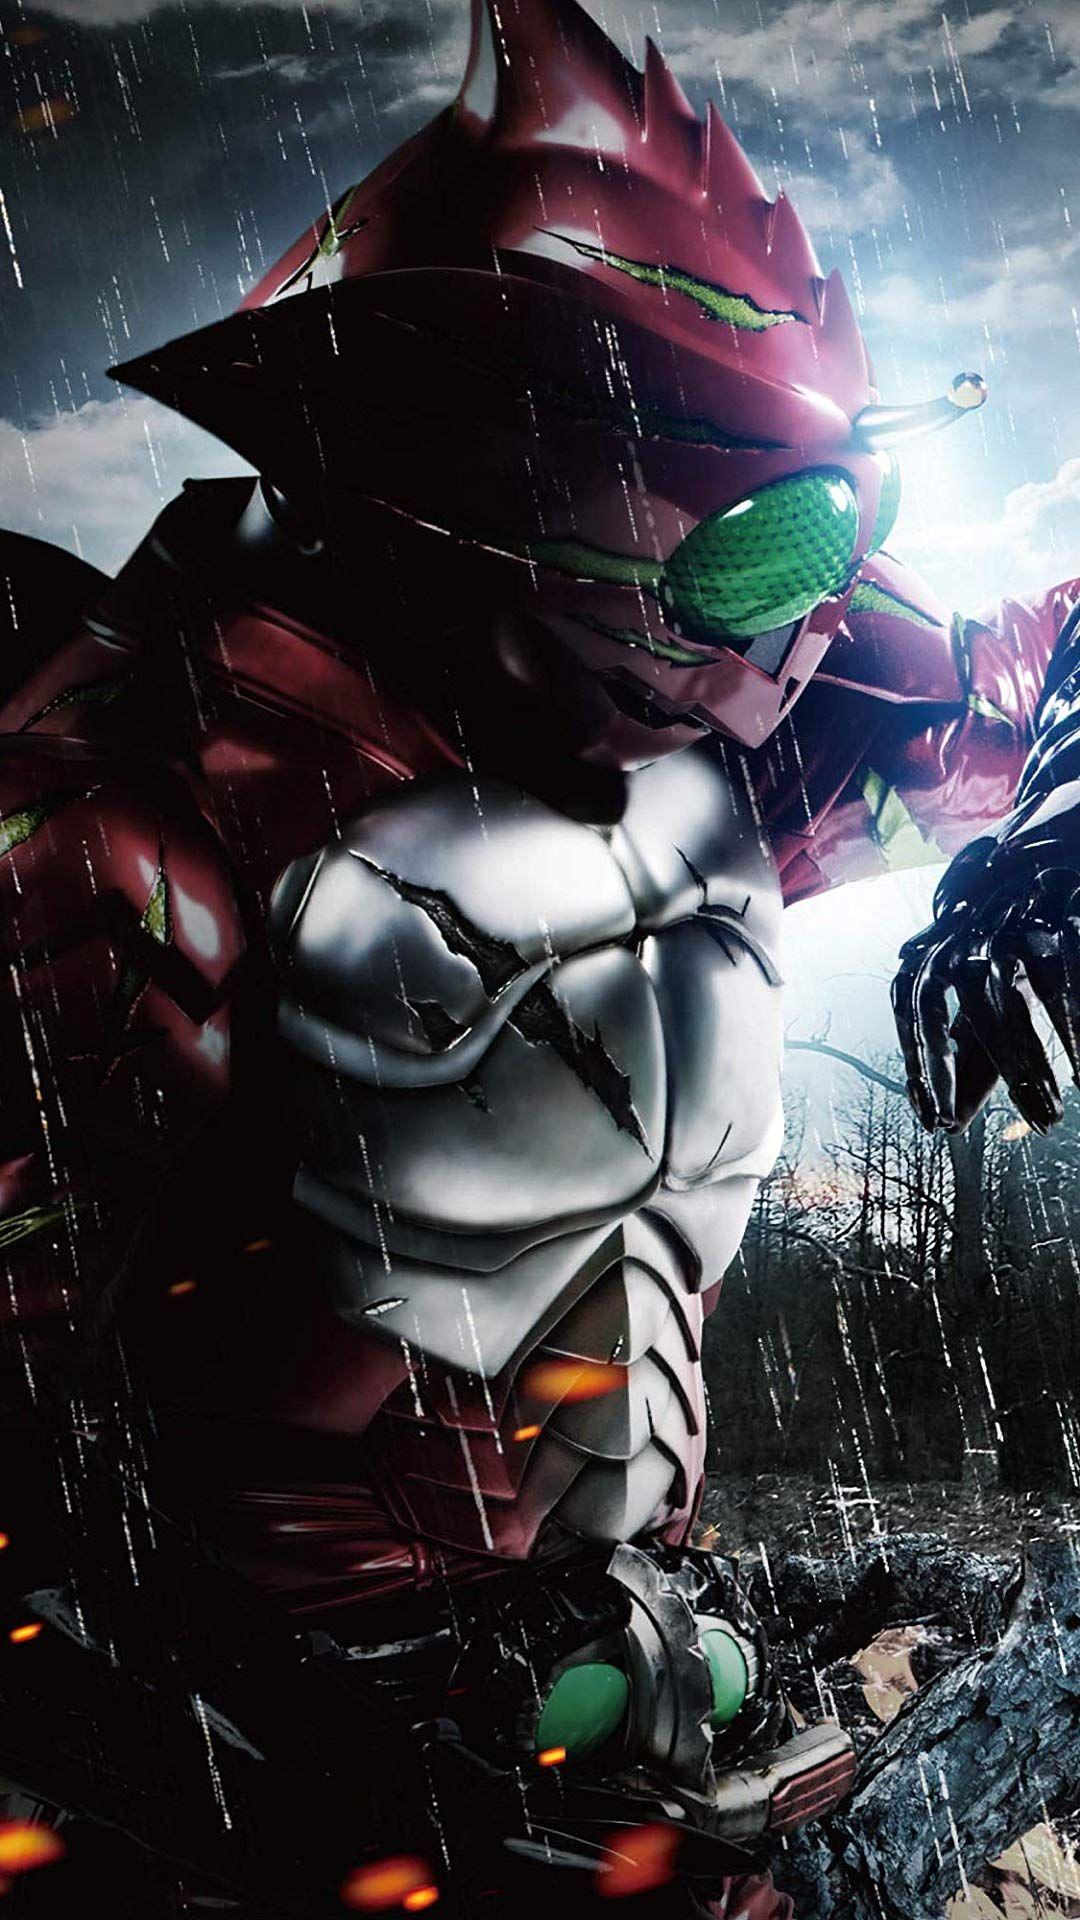 kamen rider amazon alpha 仮面ライダーアマゾンアルファ kamen raida amazon arufa ksatria animasi pemandangan anime